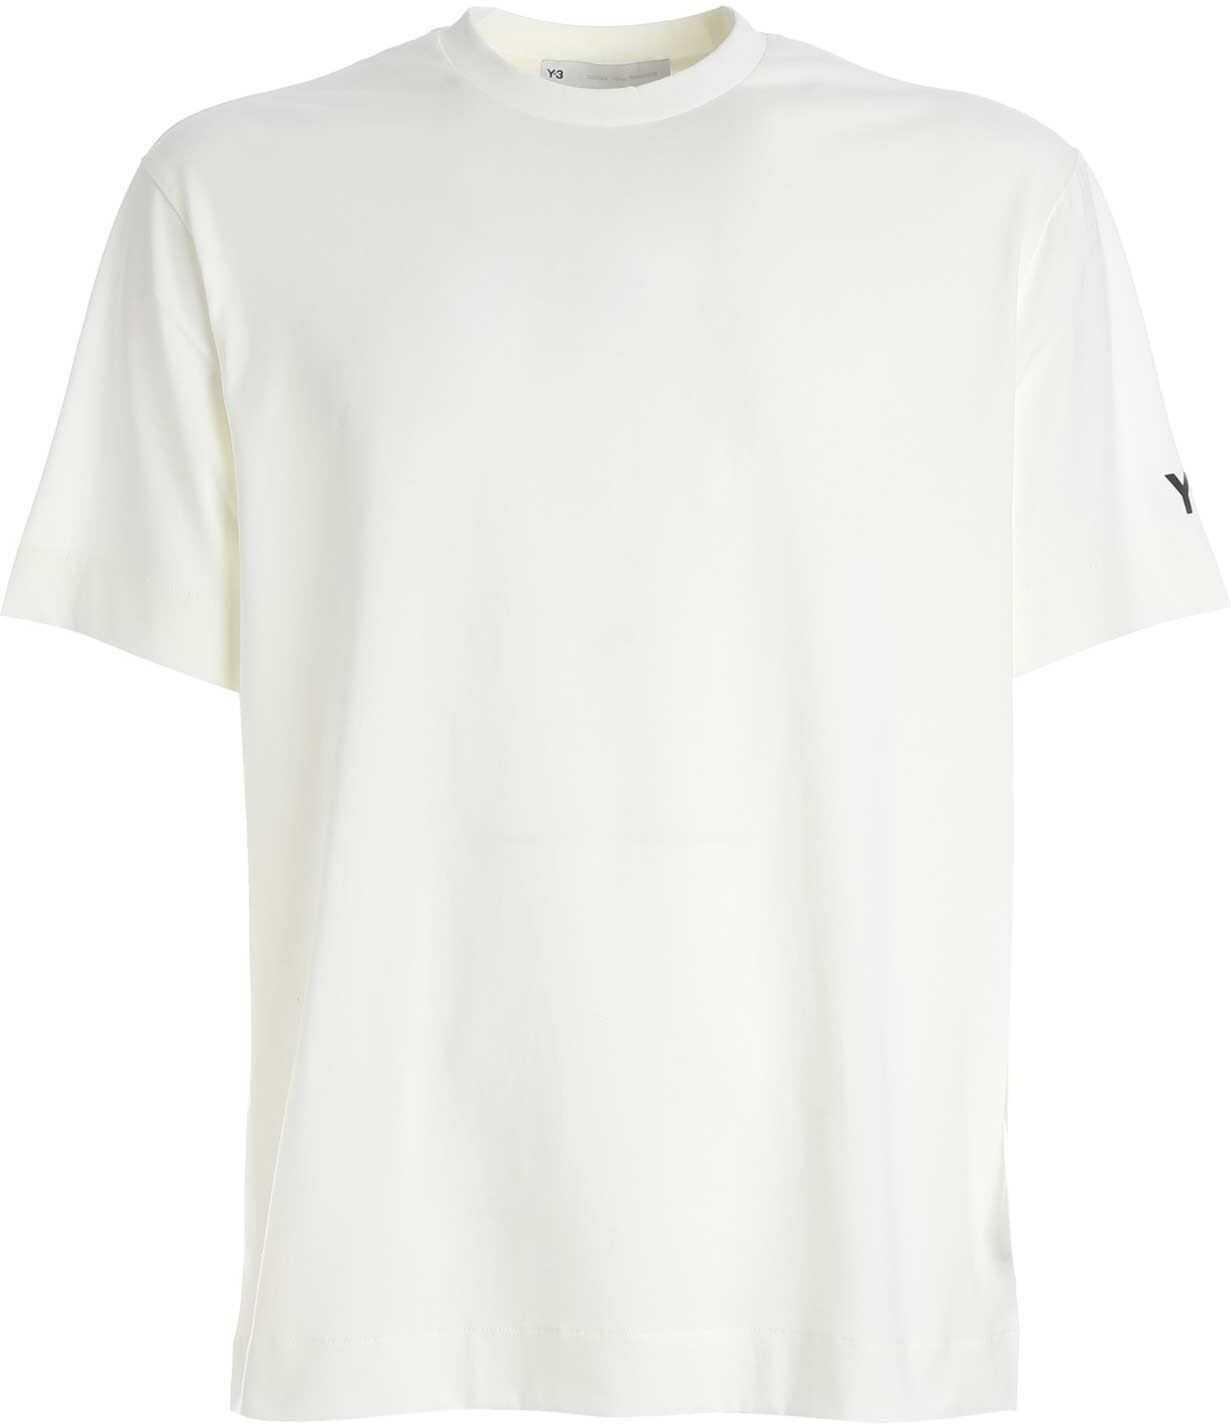 Y-3 Printed Gfx T-Shirt In White White